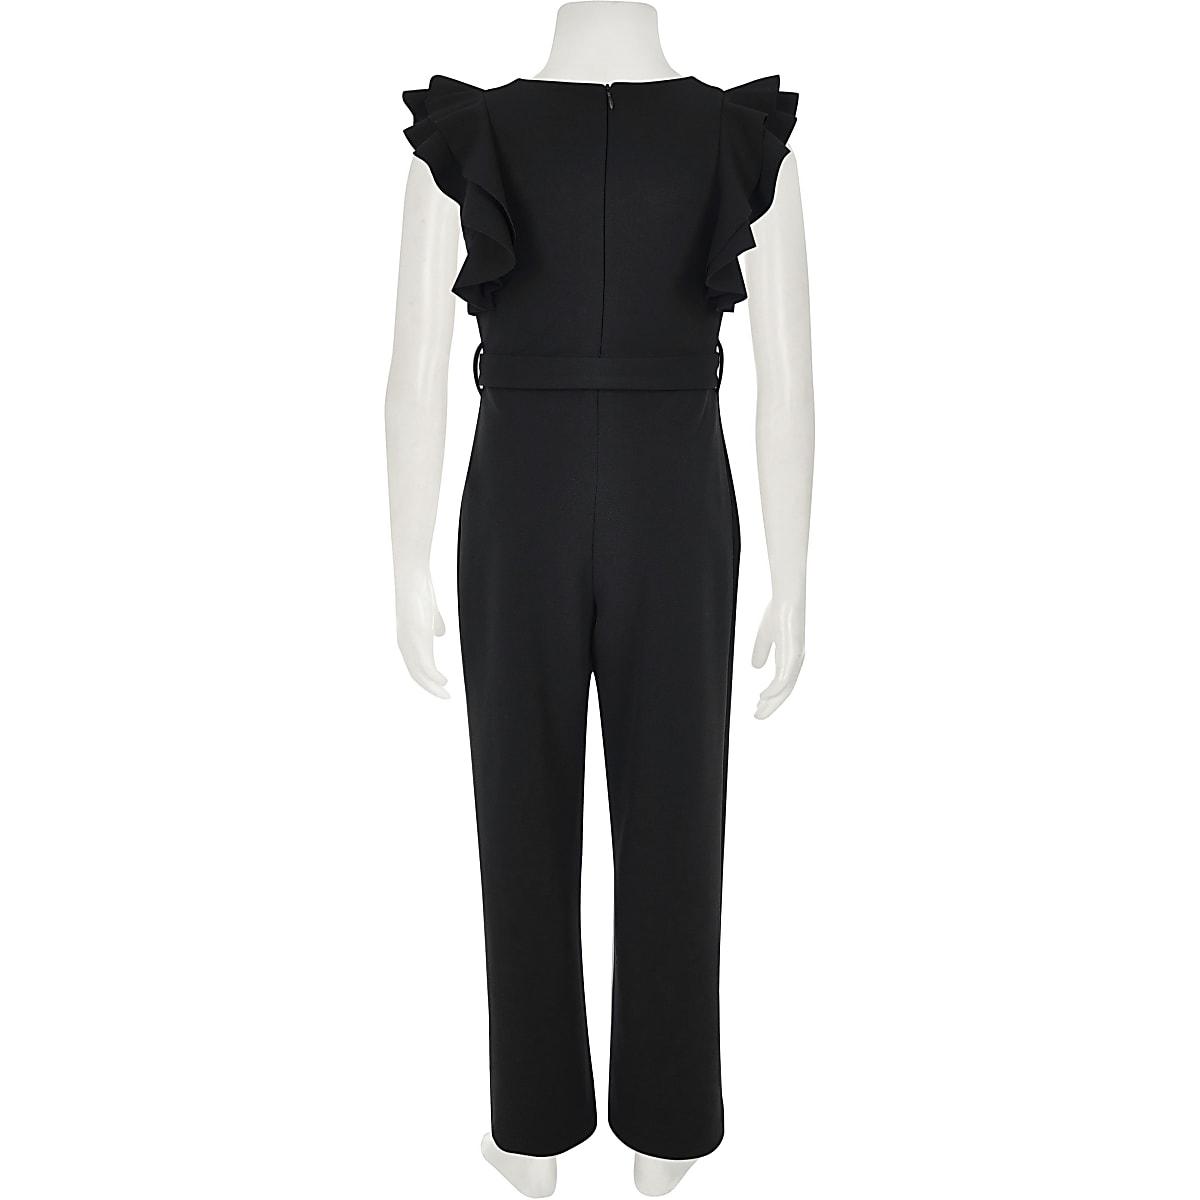 0322e7bd3d1 Girls black ruffle belted jumpsuit